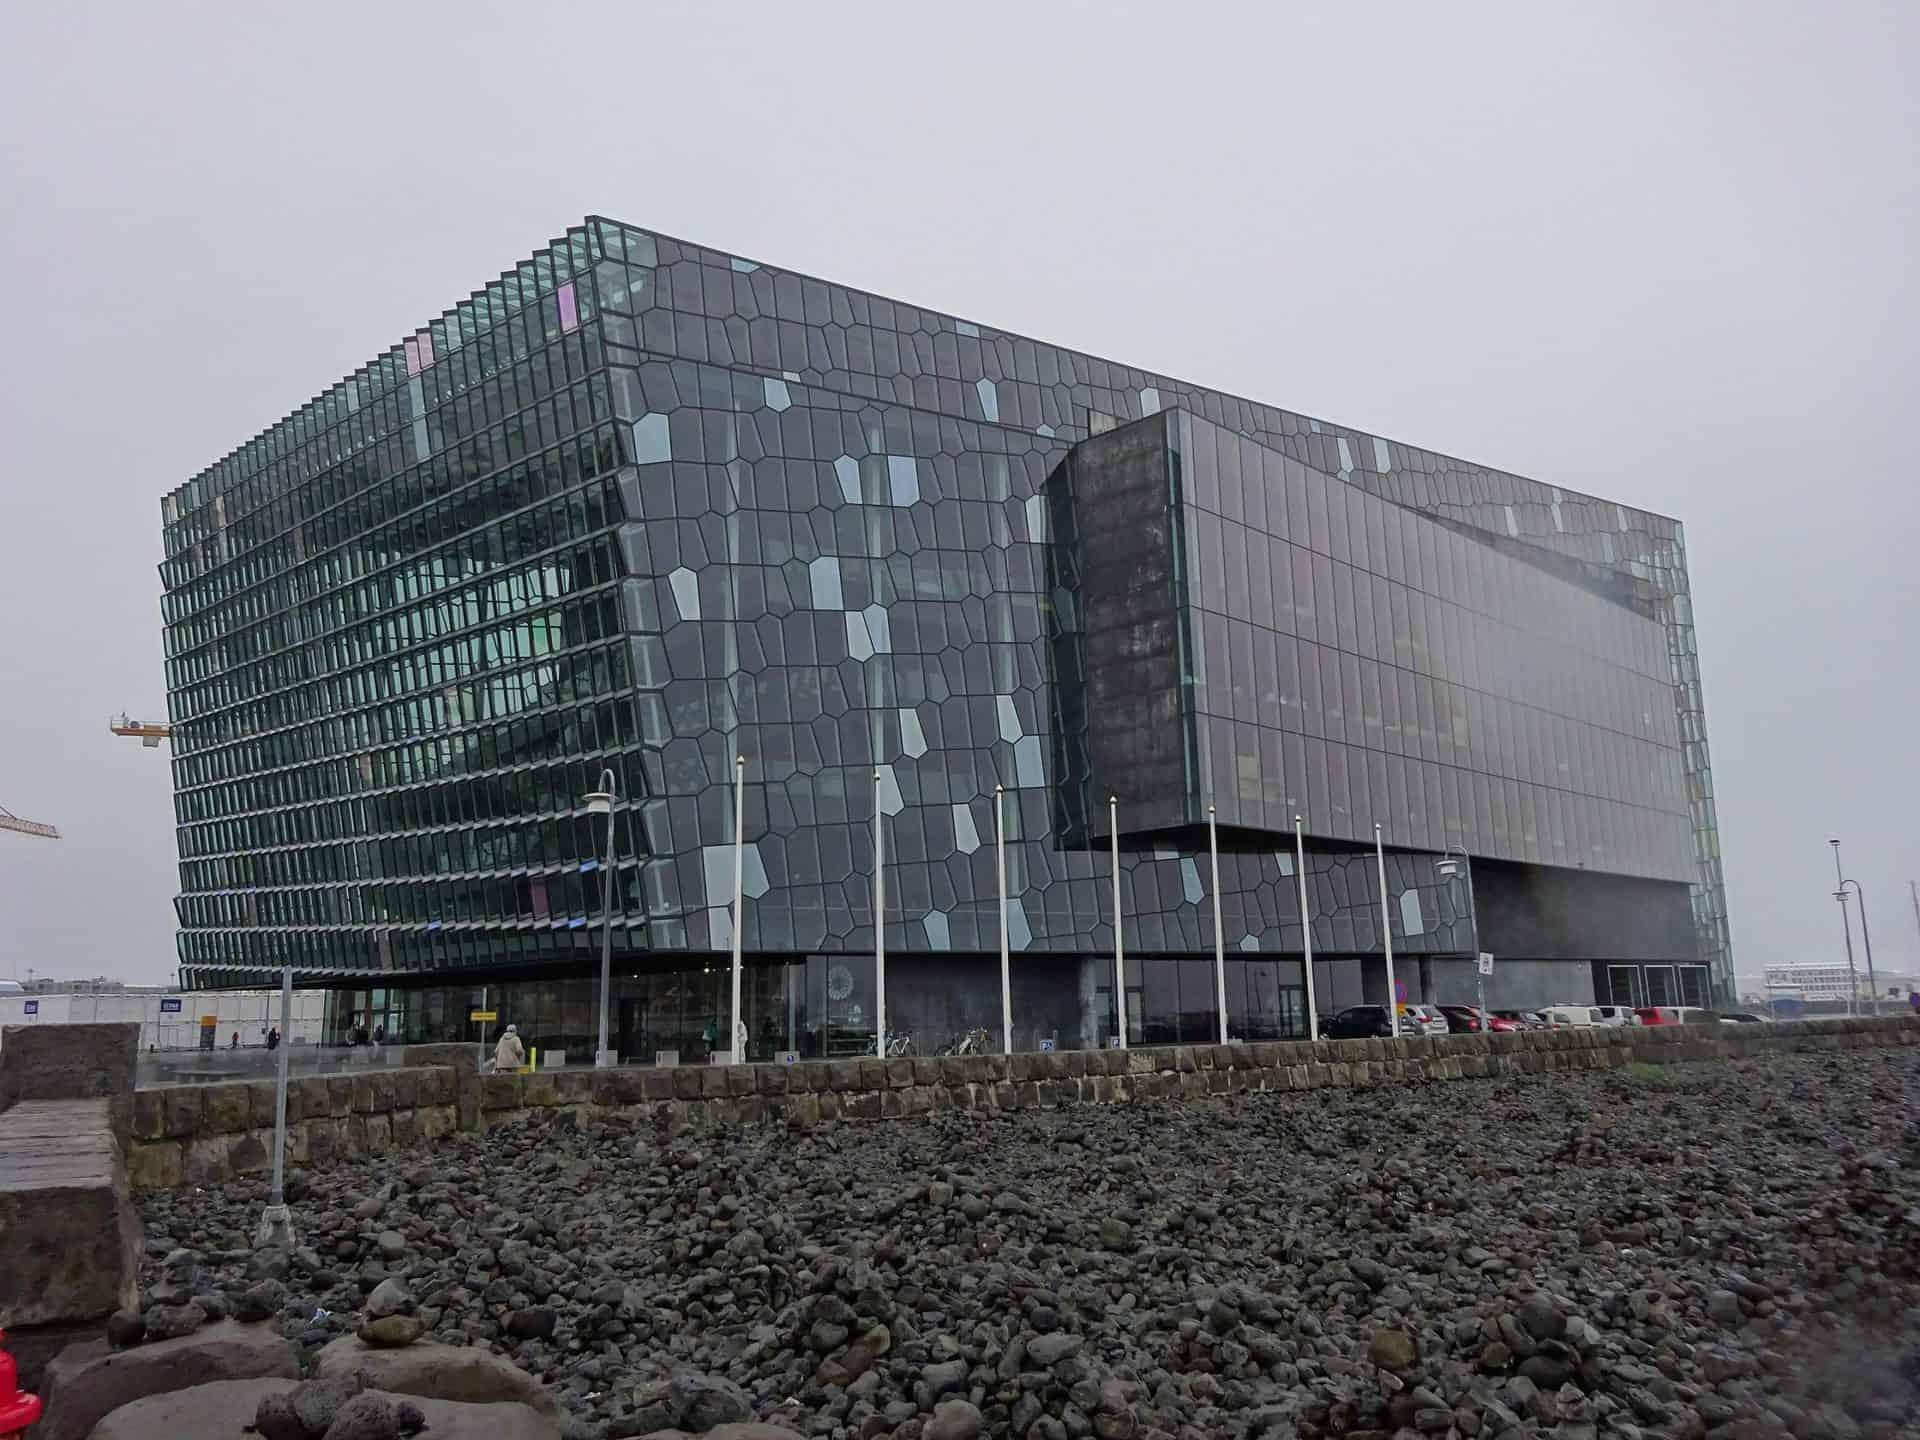 EssentialReykjavik_TourPoint6_HarpaConcertHall